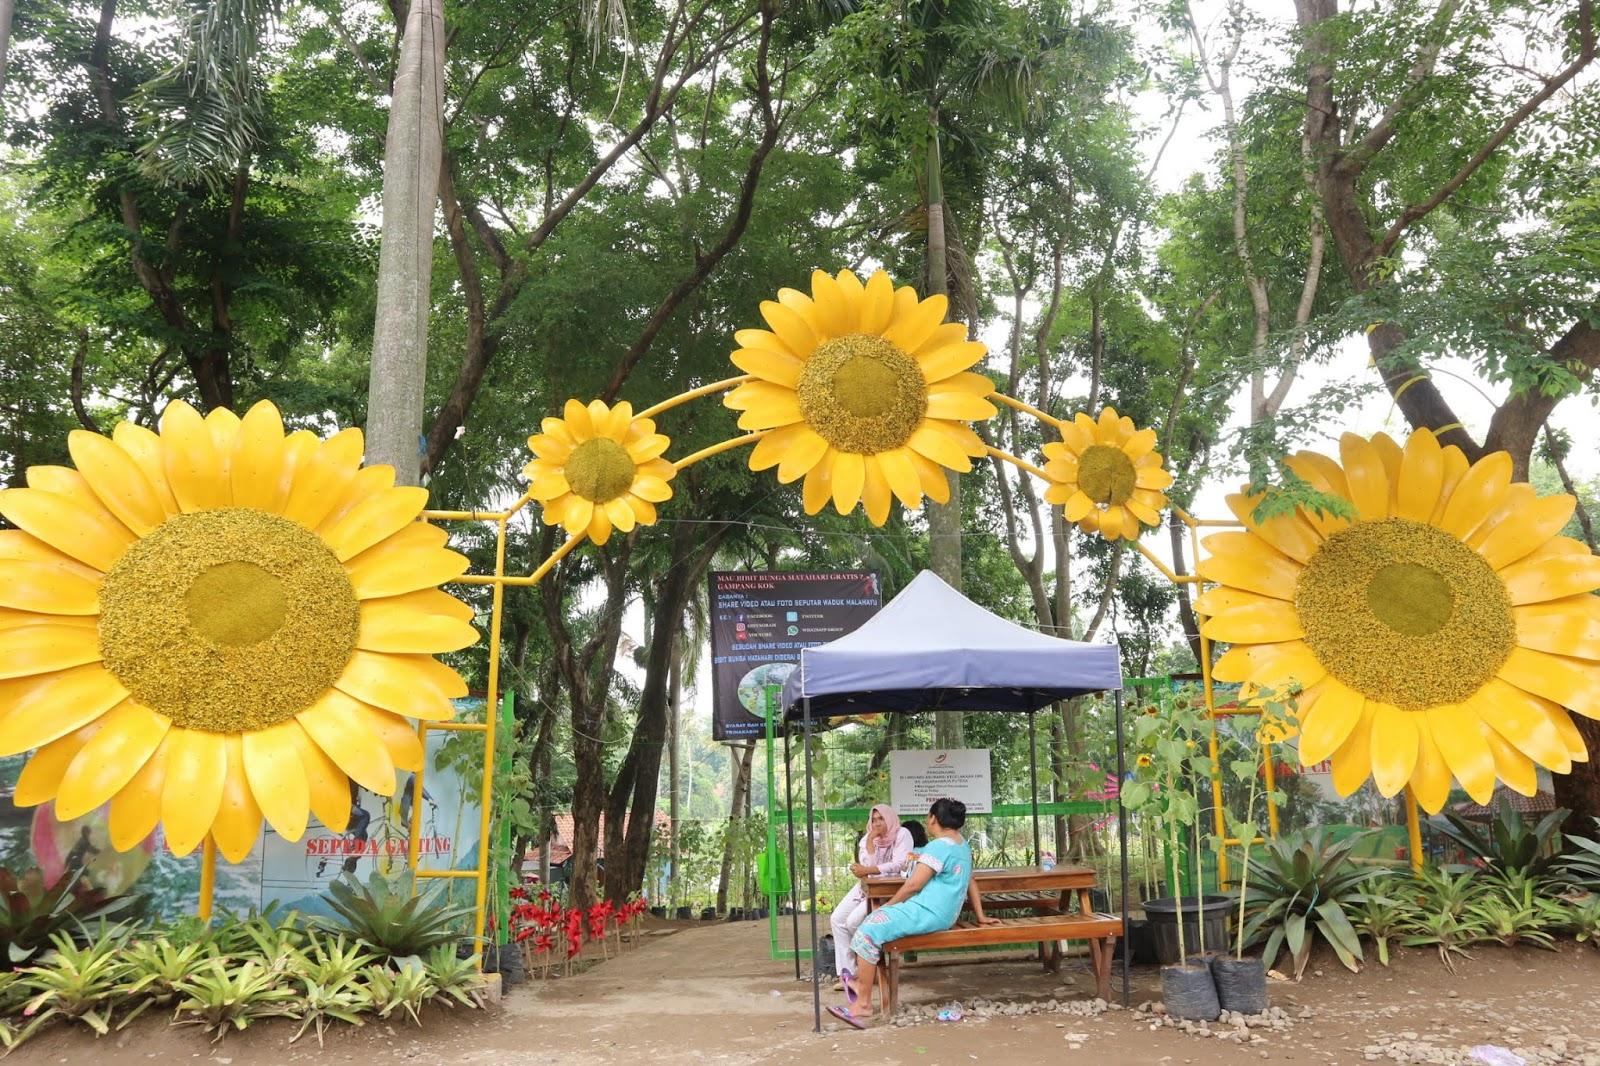 Pesona Desa Wisata Malahayu Dalam Ekowisata Dan Edukasi